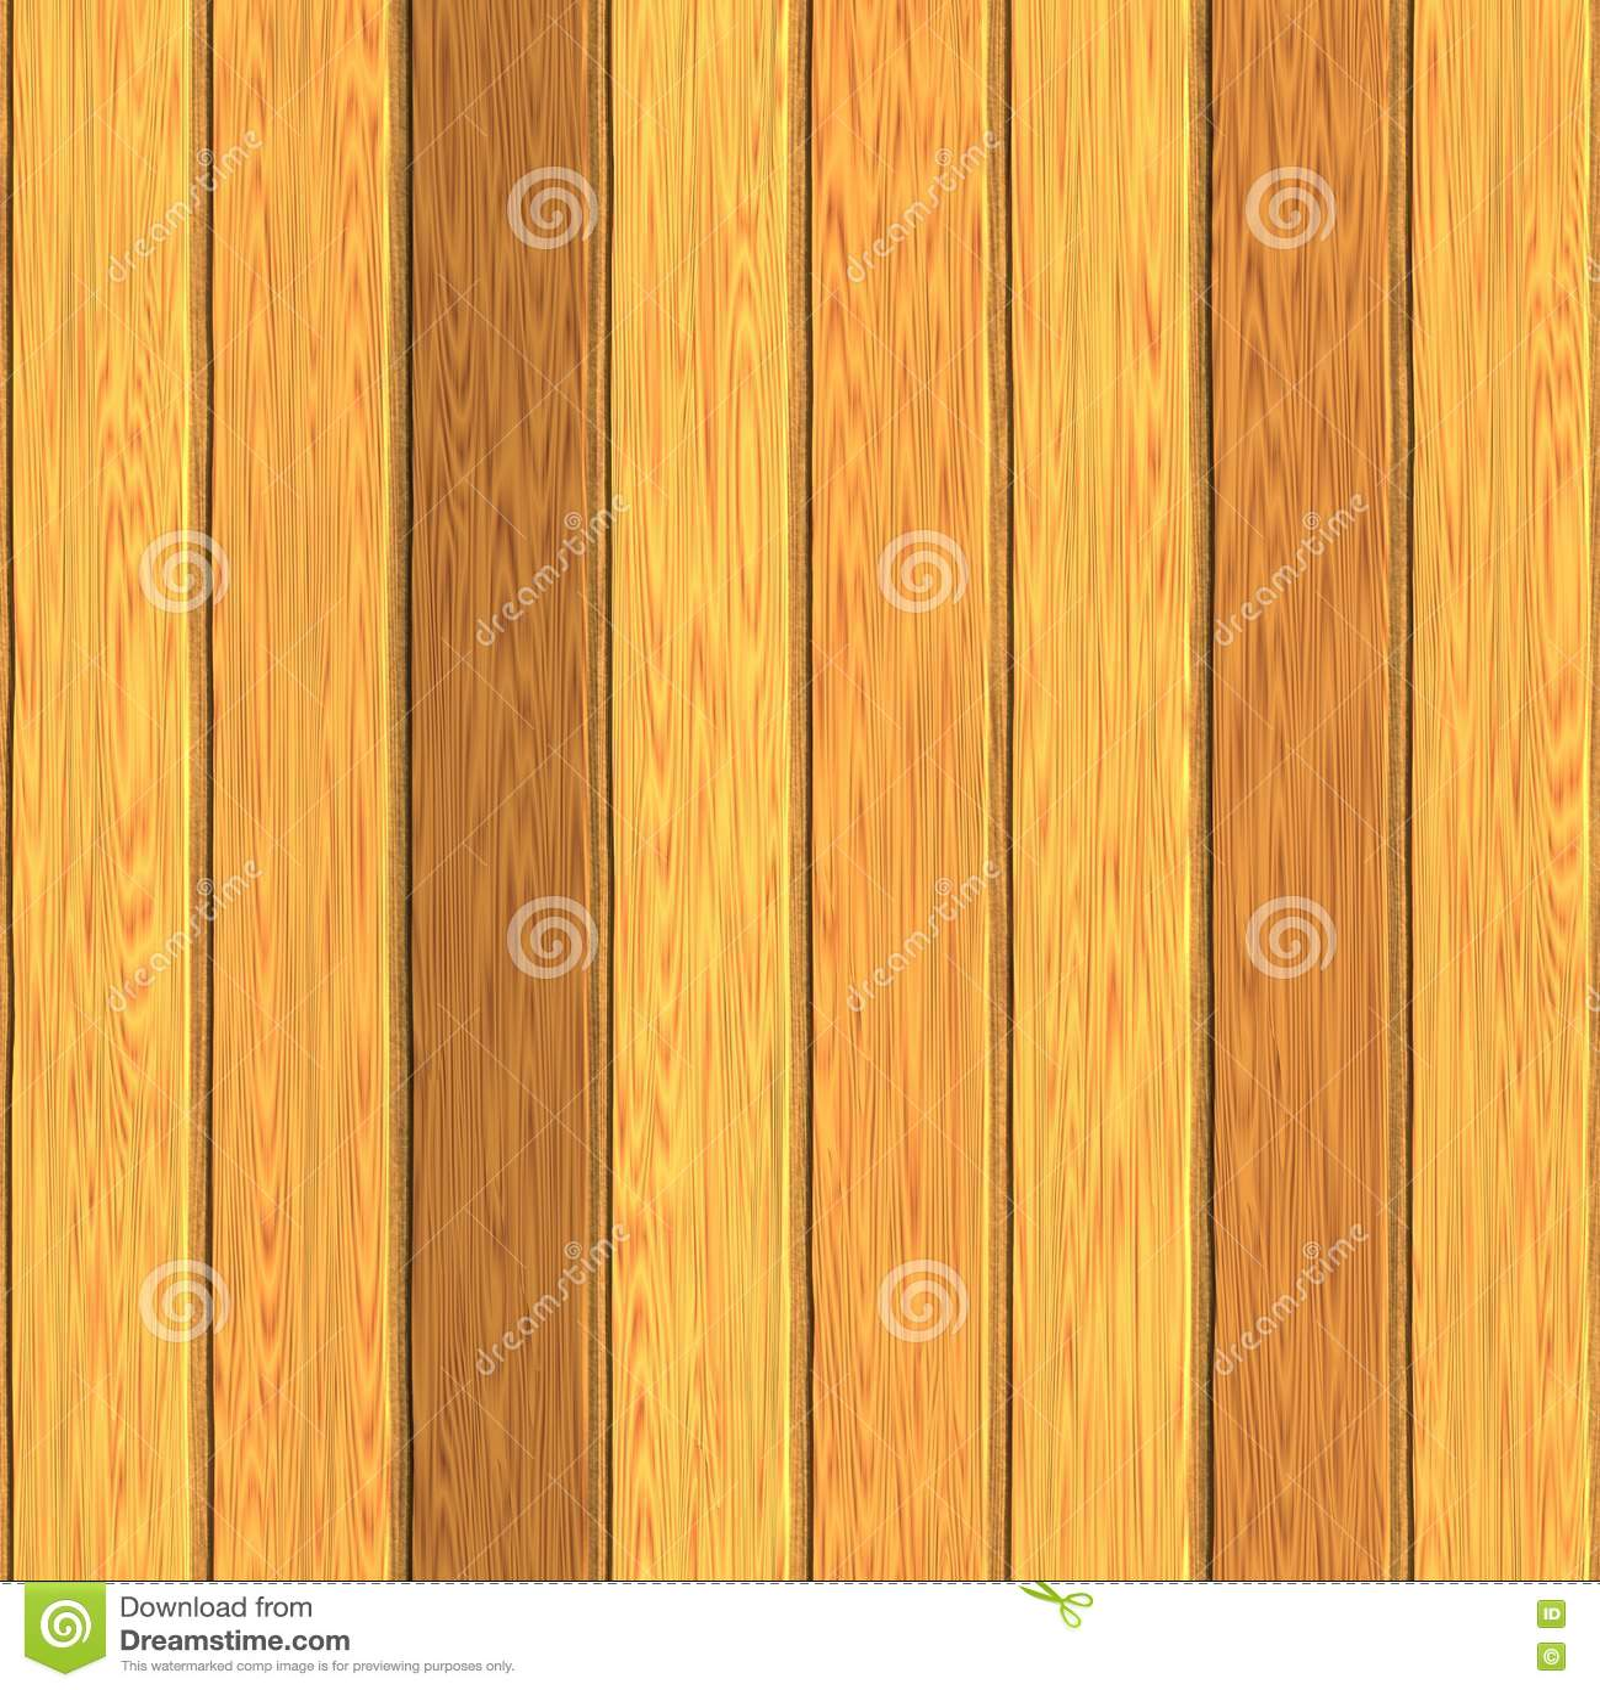 seamless texture wooden parquet laminate flooring 3d illustration